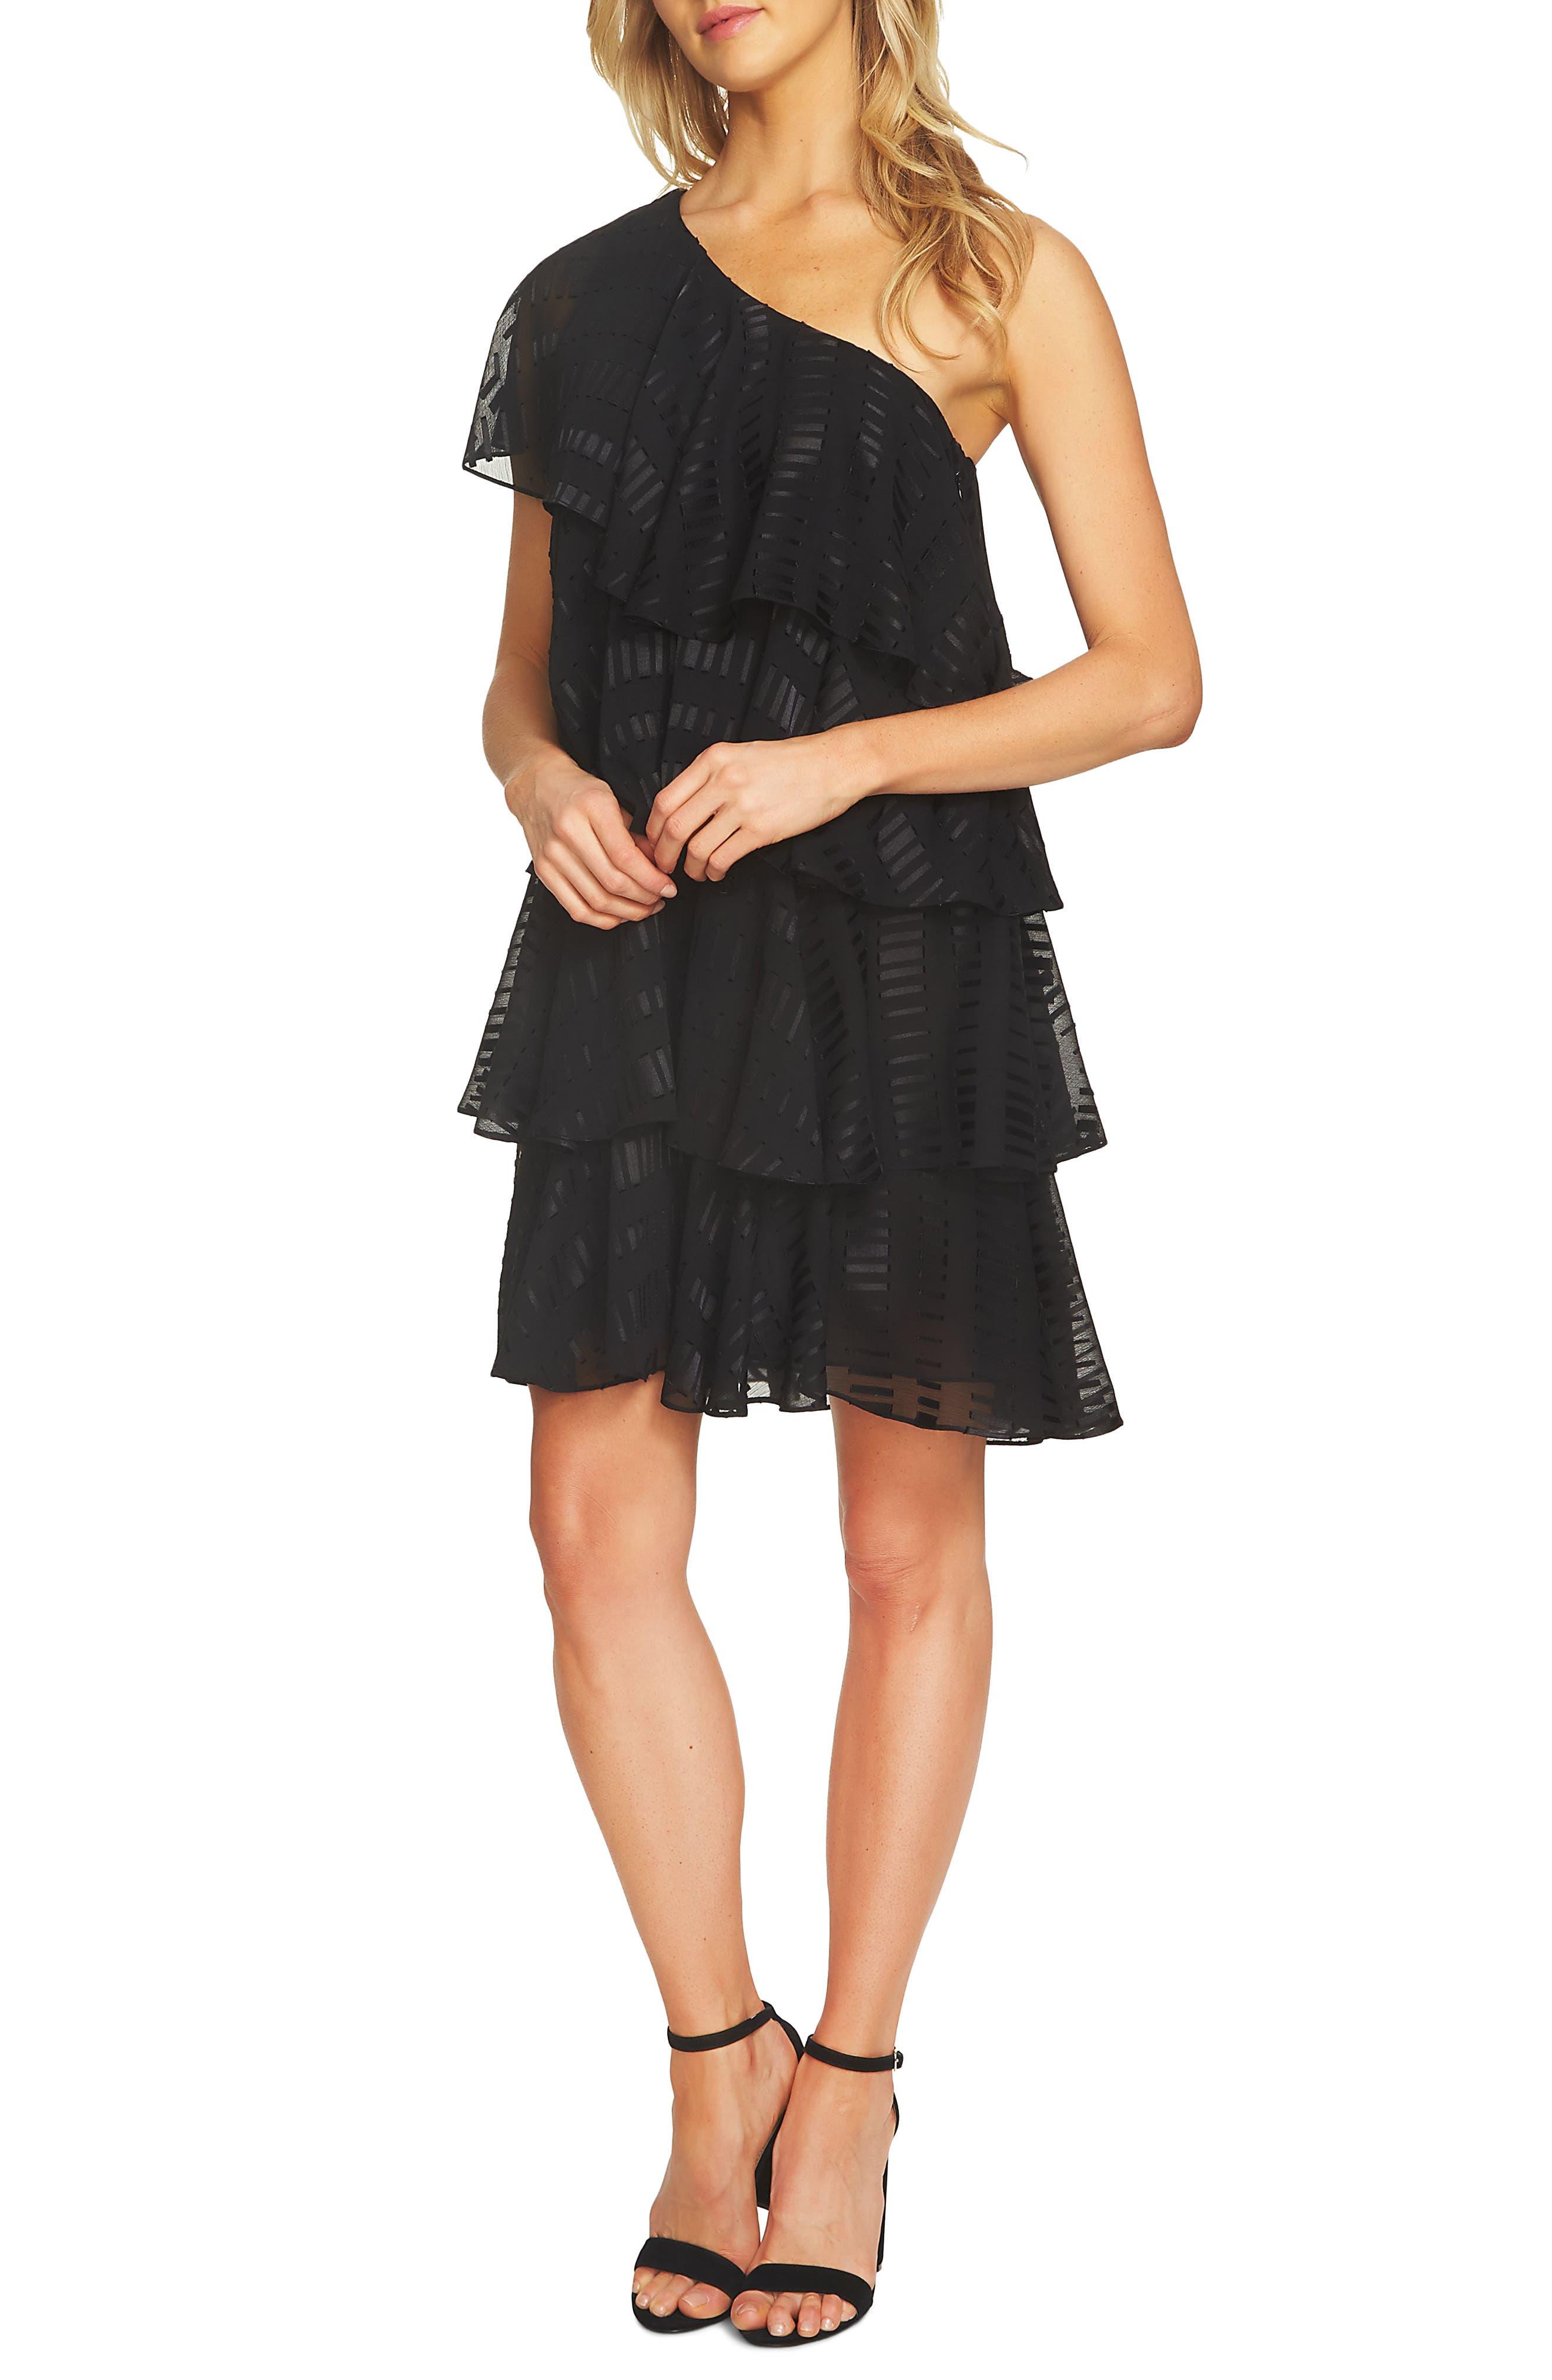 CeCe One Shoulder Ruffle Tiered Dress